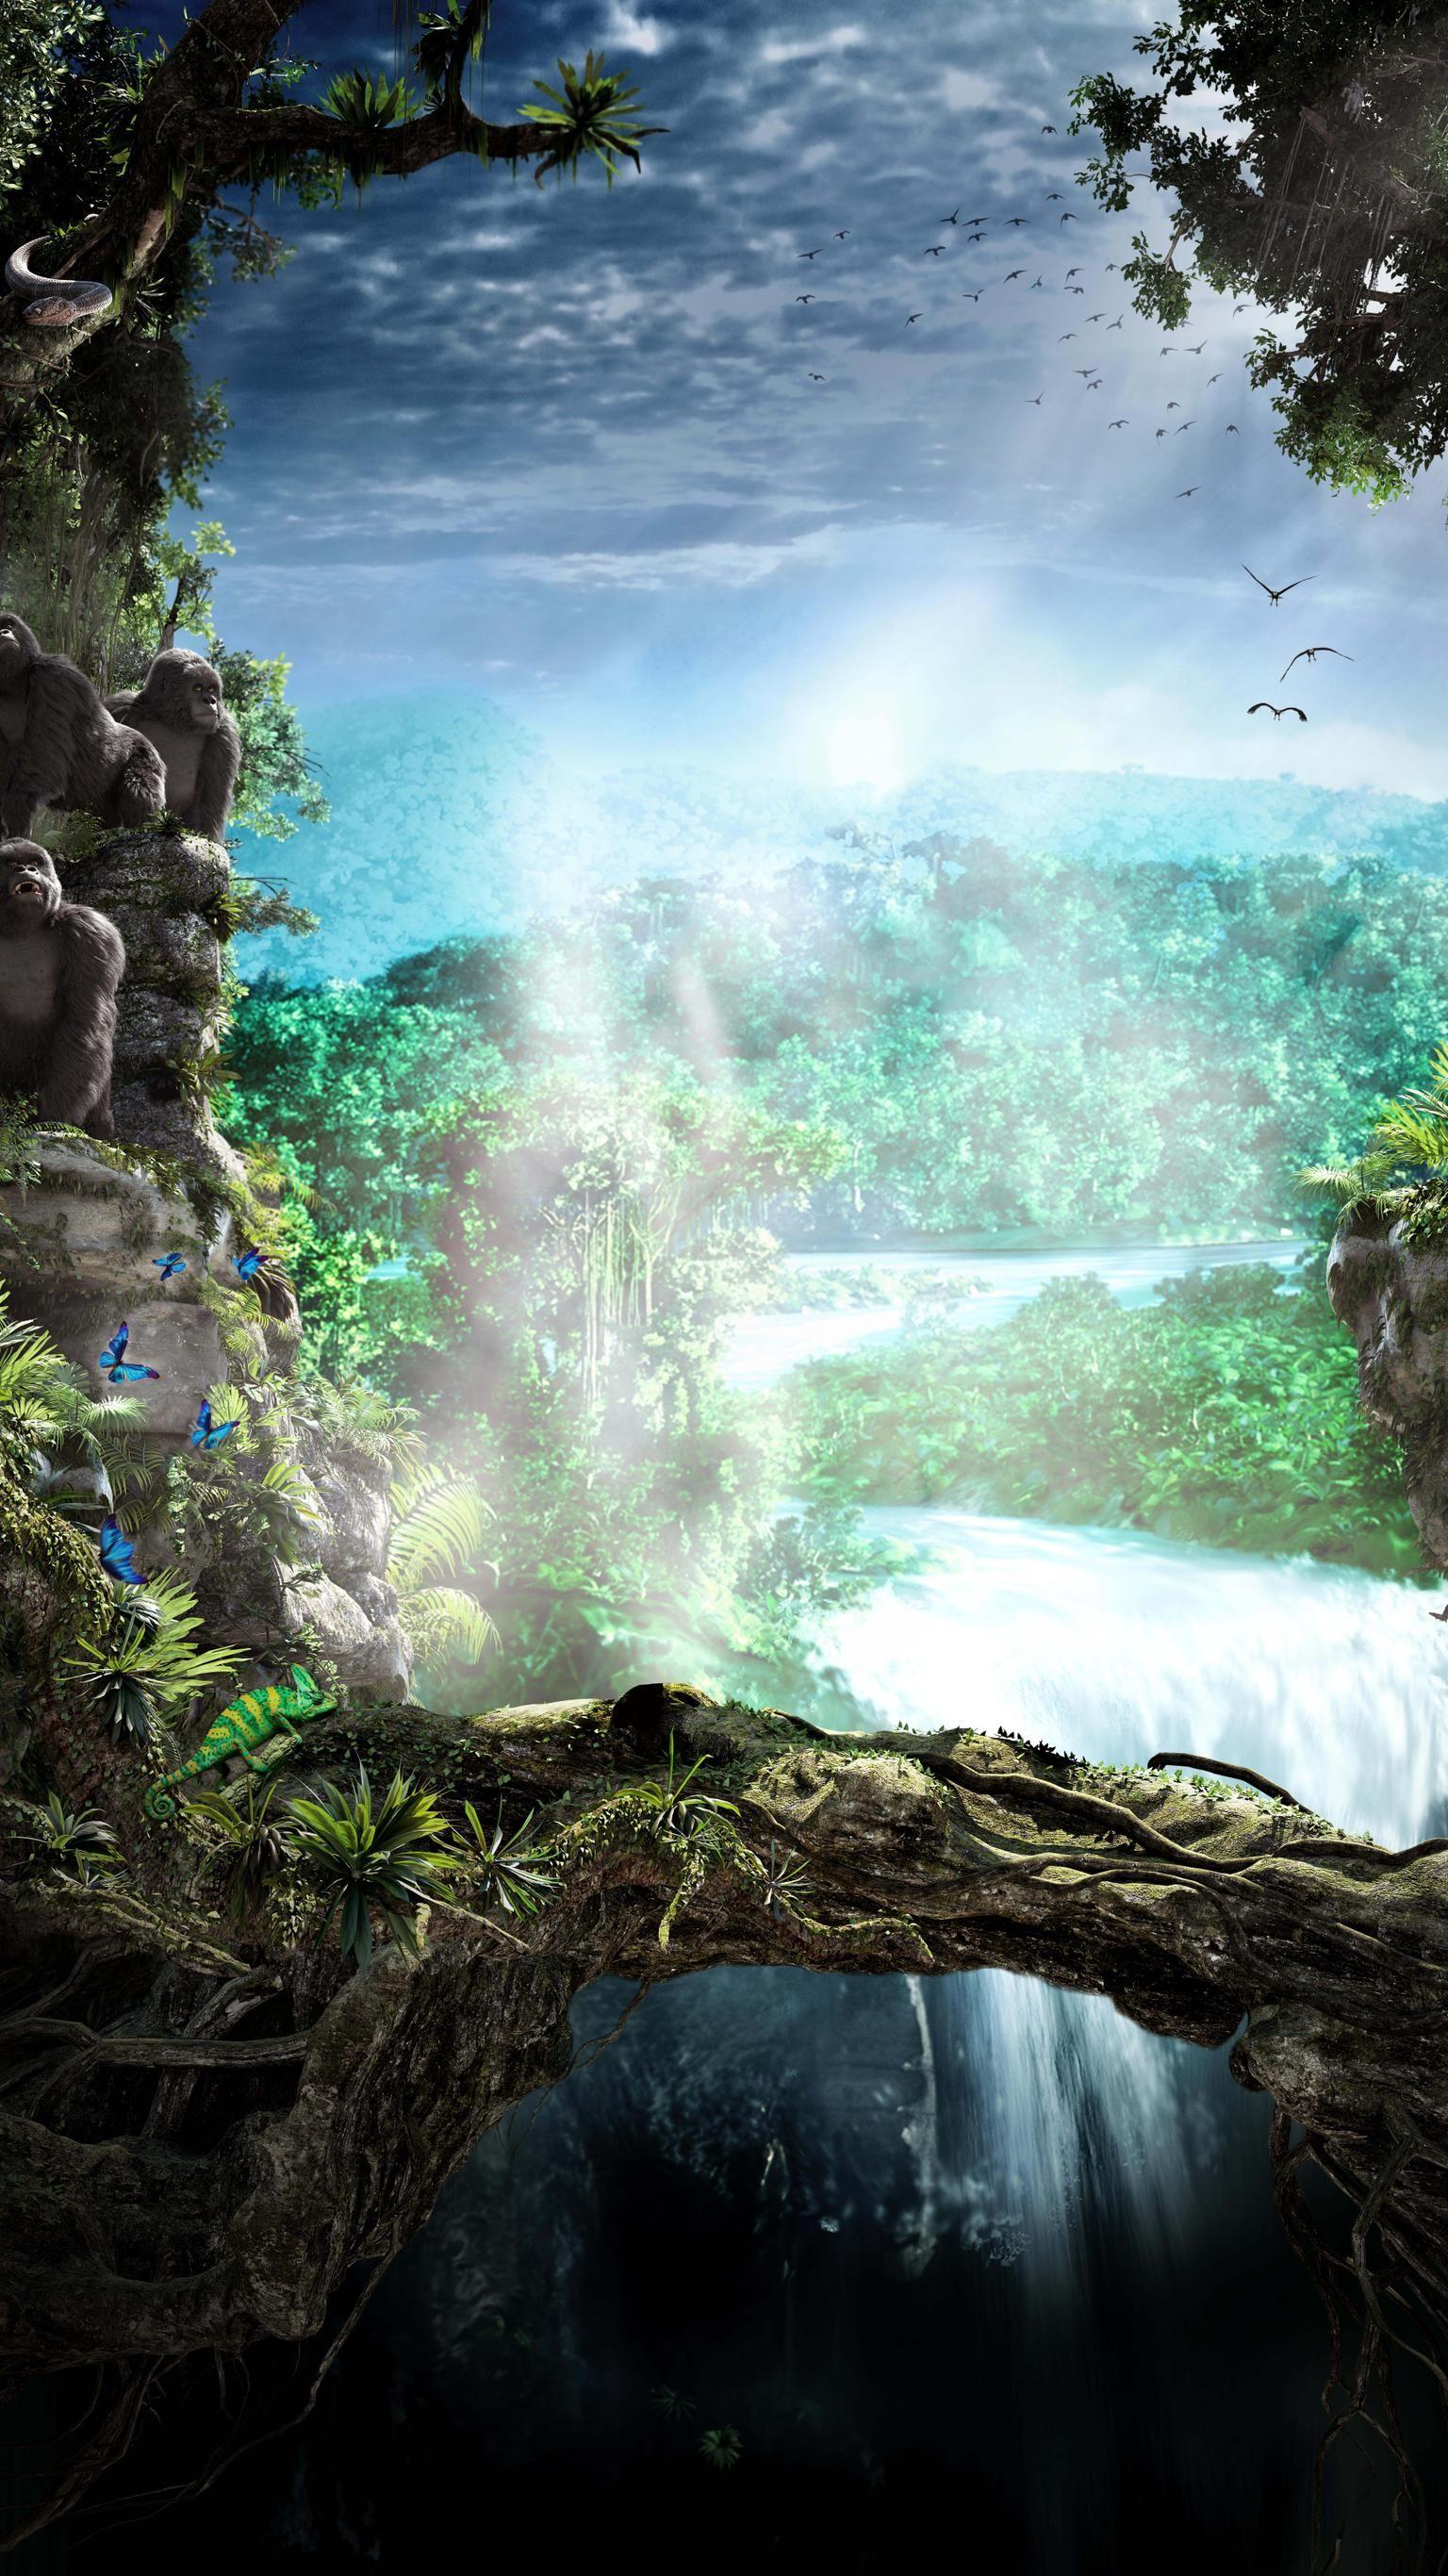 Tarzan 2013 Phone Wallpaper Studio Background Images Picsart Background Photo Background Images